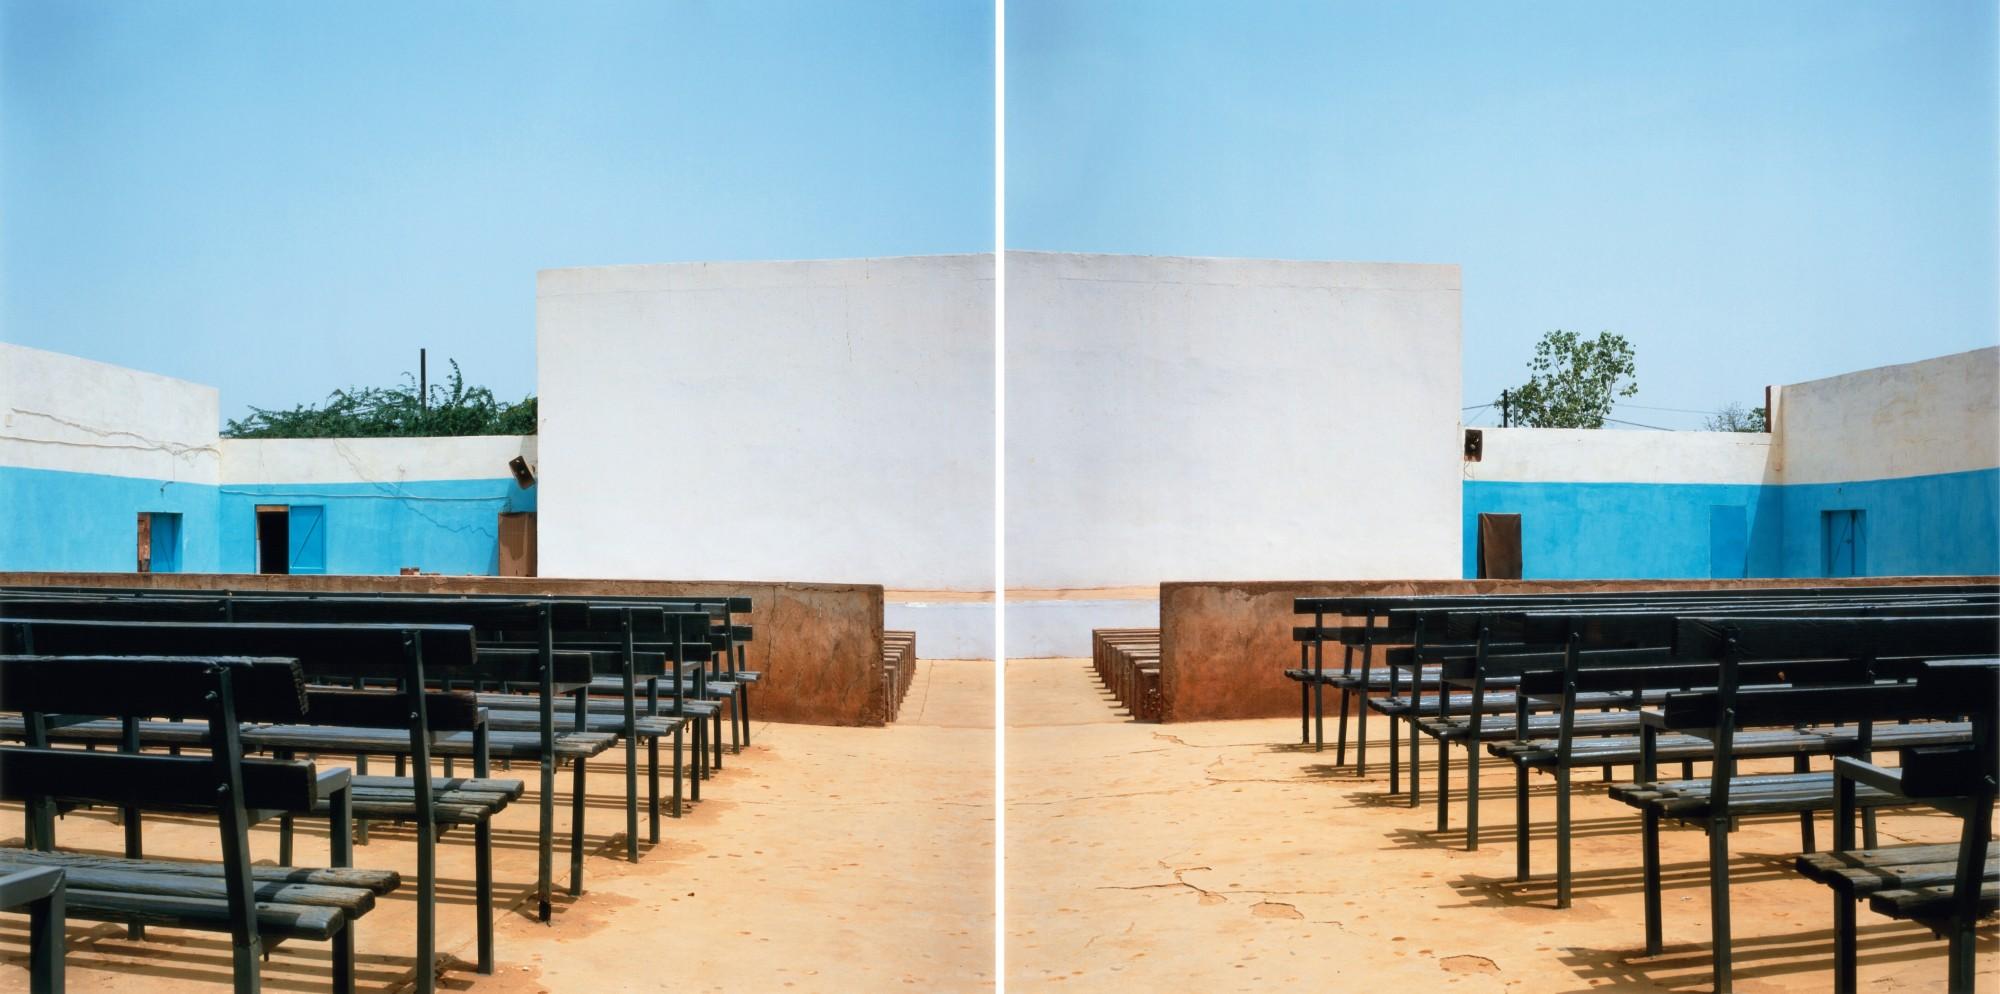 Fantôme Créole Series (Cinema Cinema), 2005  Diptych of Lambda prints on gloss paper  119.5 x 119.5 cm, 47 1/8 x 47 1/8 in (each)